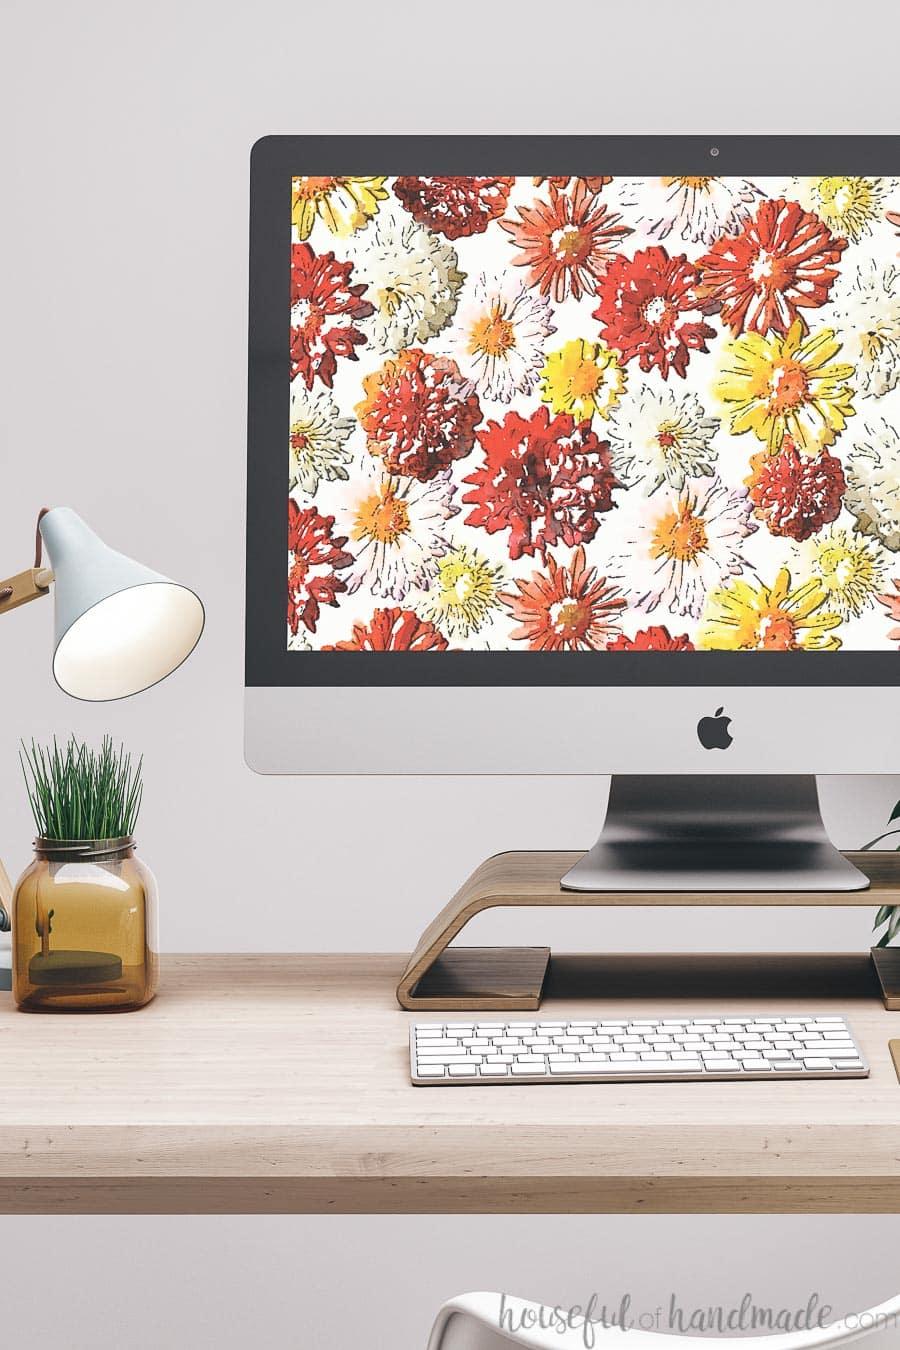 iMac desktop computer with watercolor fall mum print on the screen as digital wallpaper.